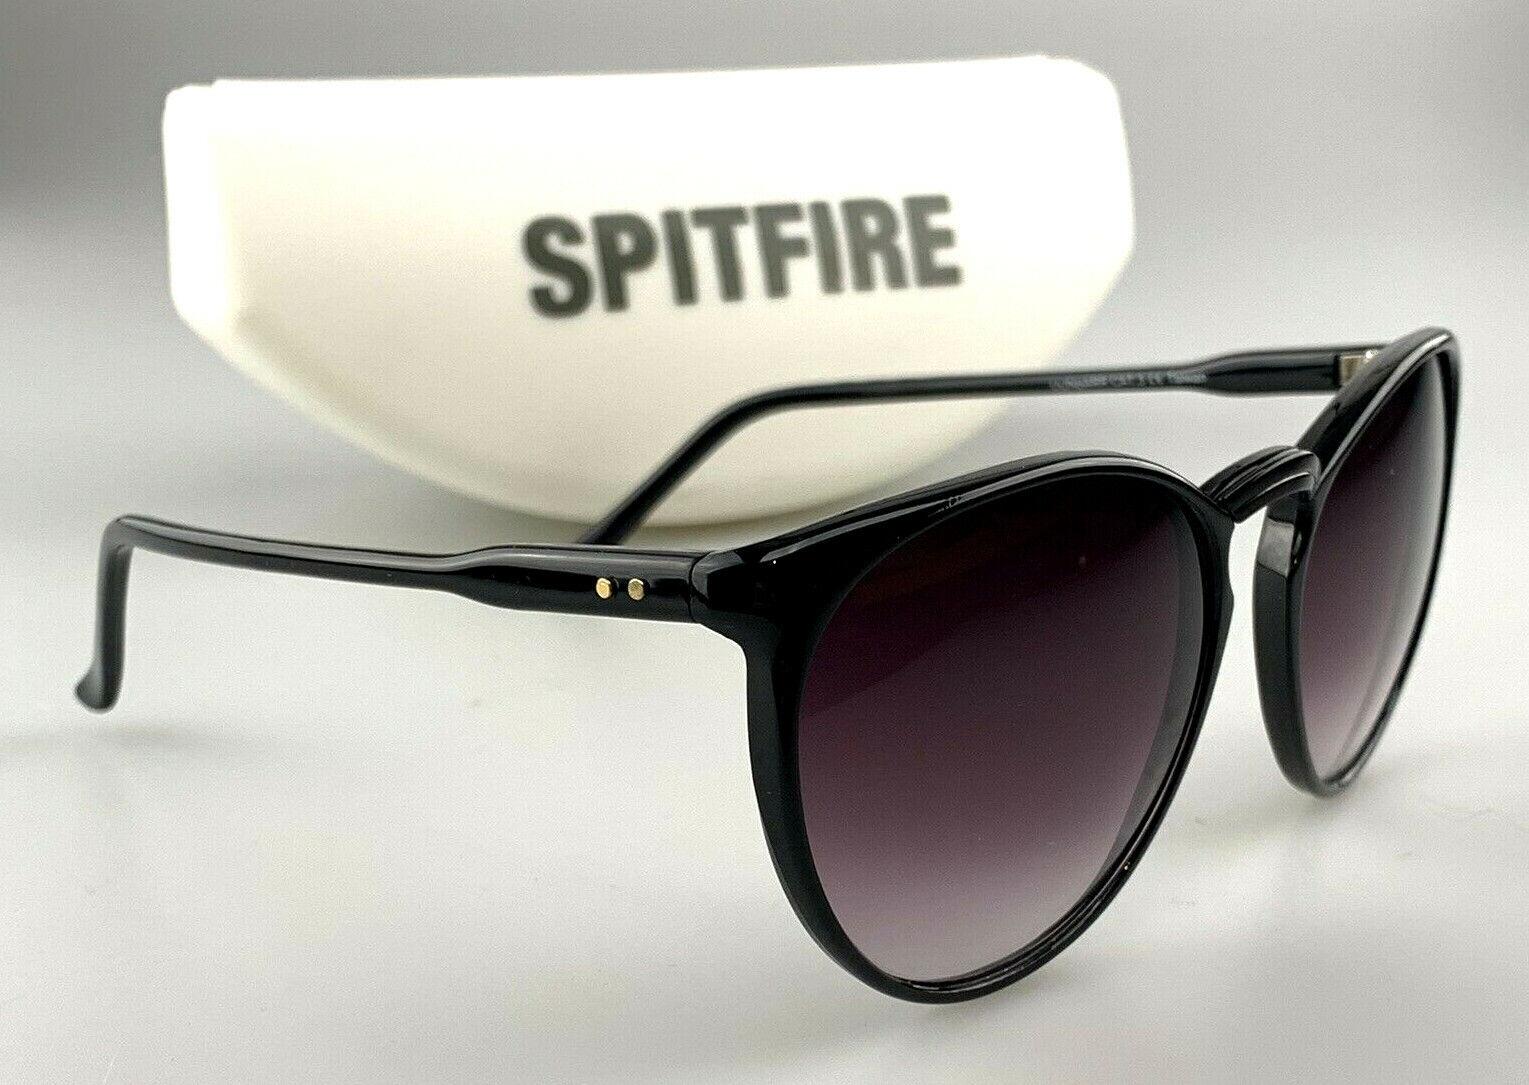 Spitfire Sunglasses mod. Dunbarr Black Cat Eye Shades With Case